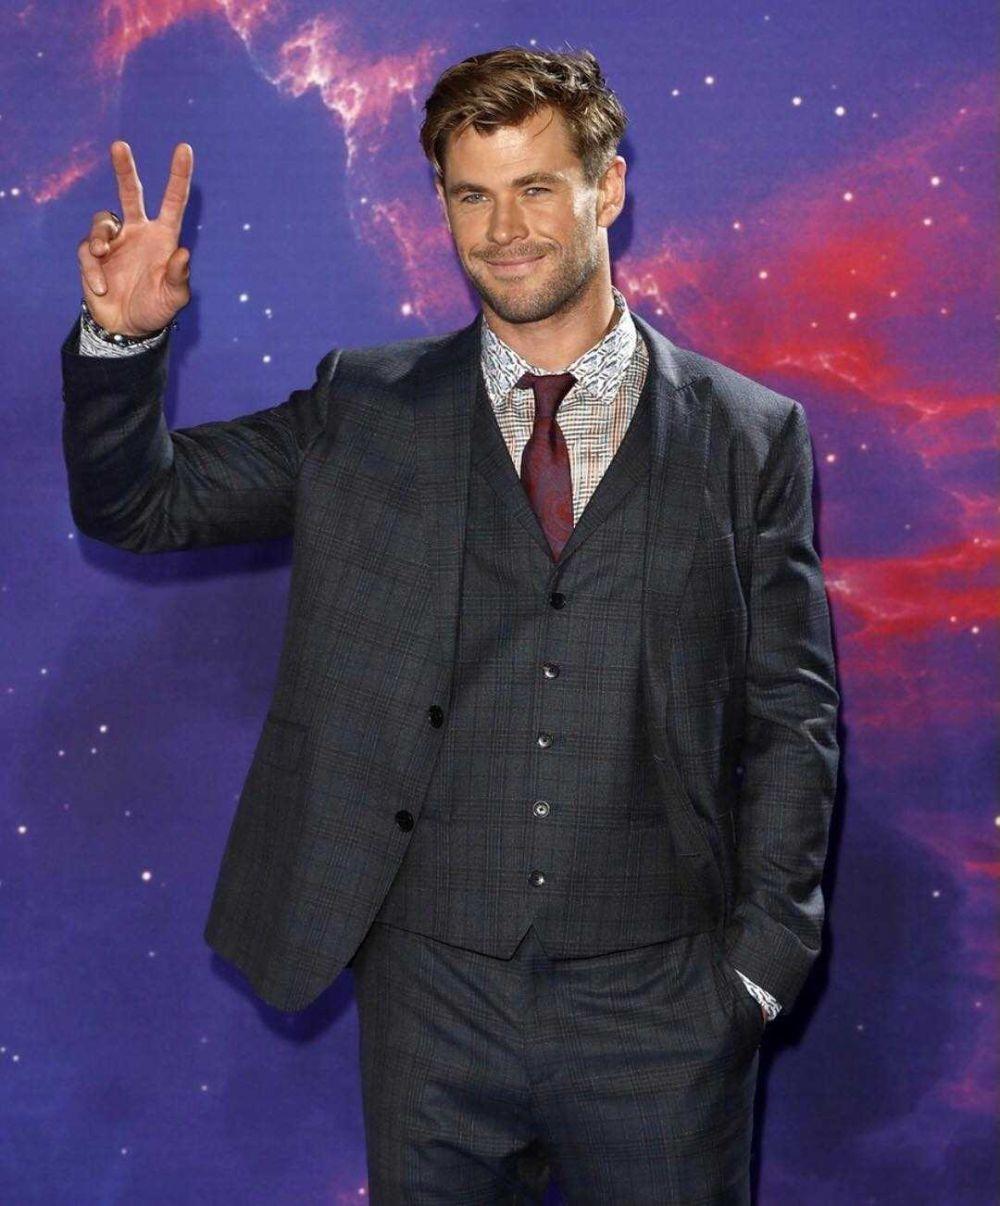 Gabung Spin-Off 'Mad Max', 9 Potret Chris Hemsworth yang Super Stylish